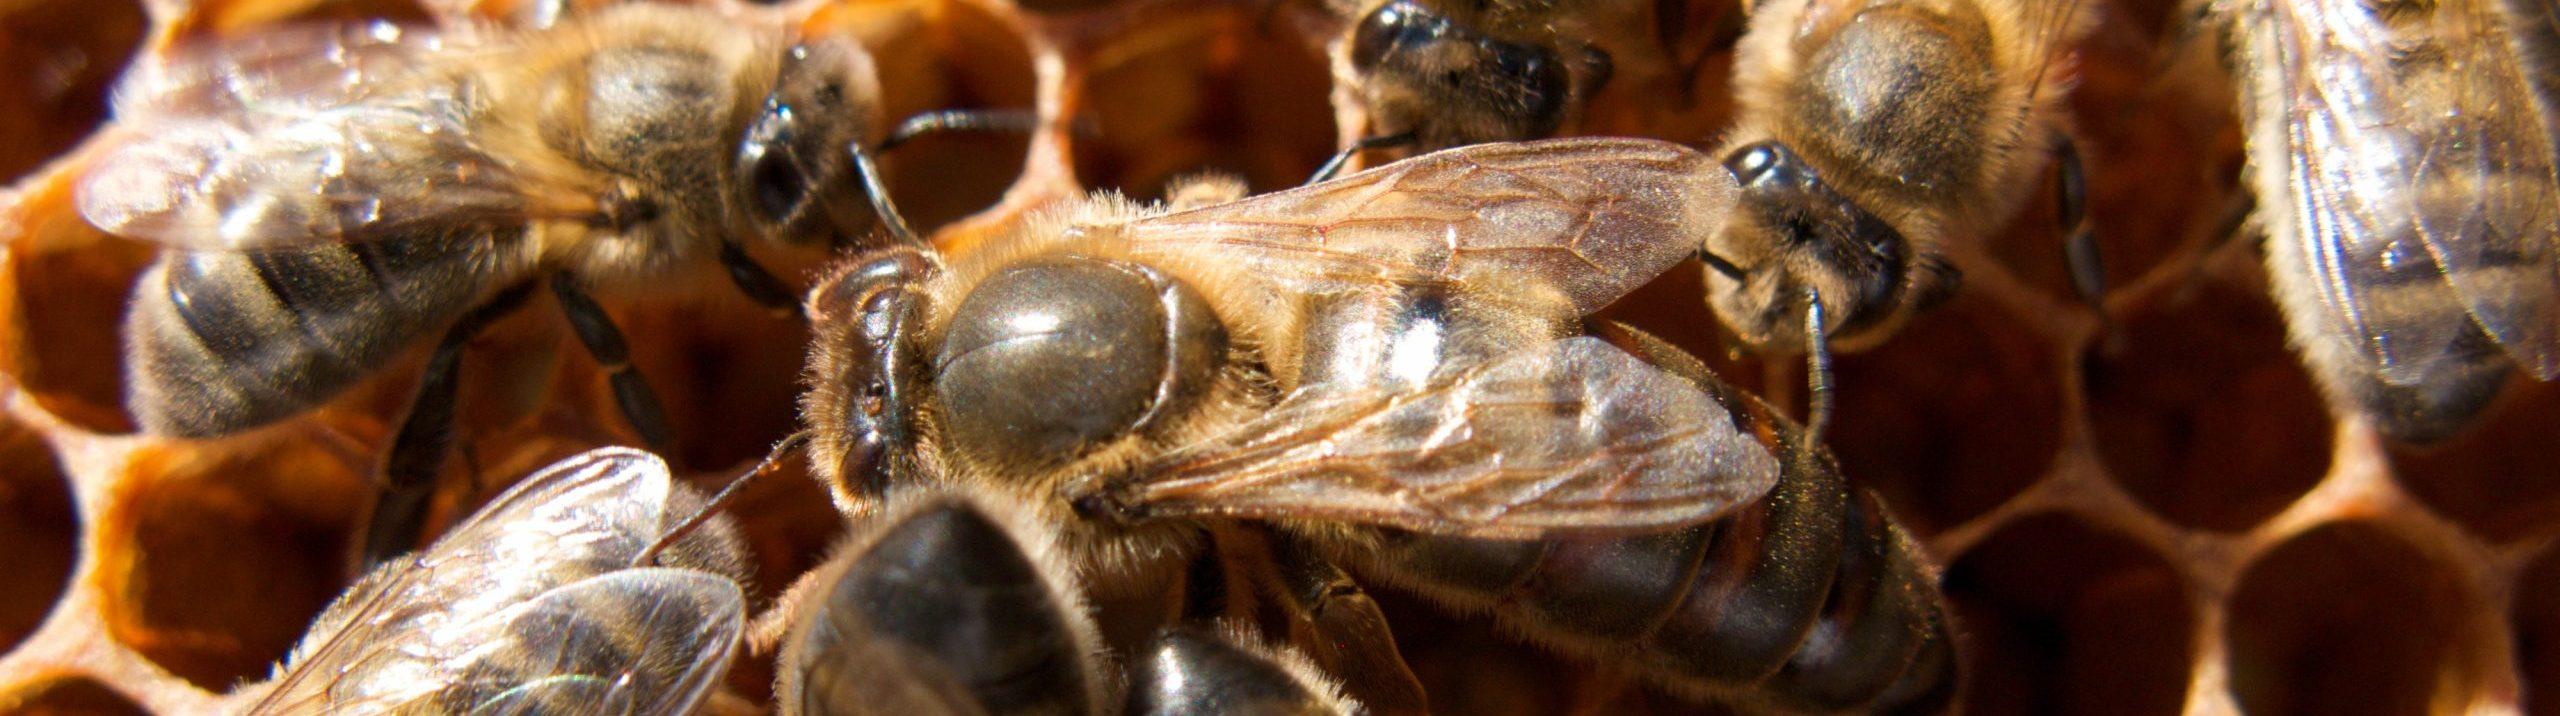 Nordic brown bees crawling around.